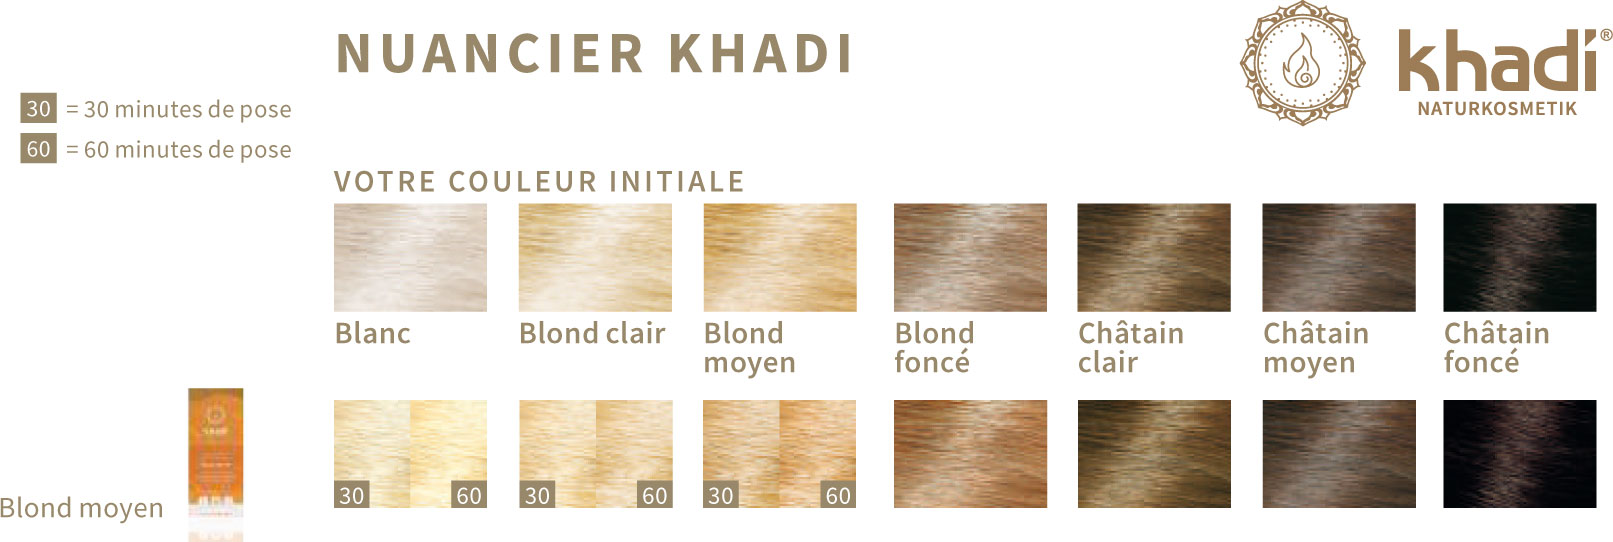 Nuancier Khadi Blond moyen